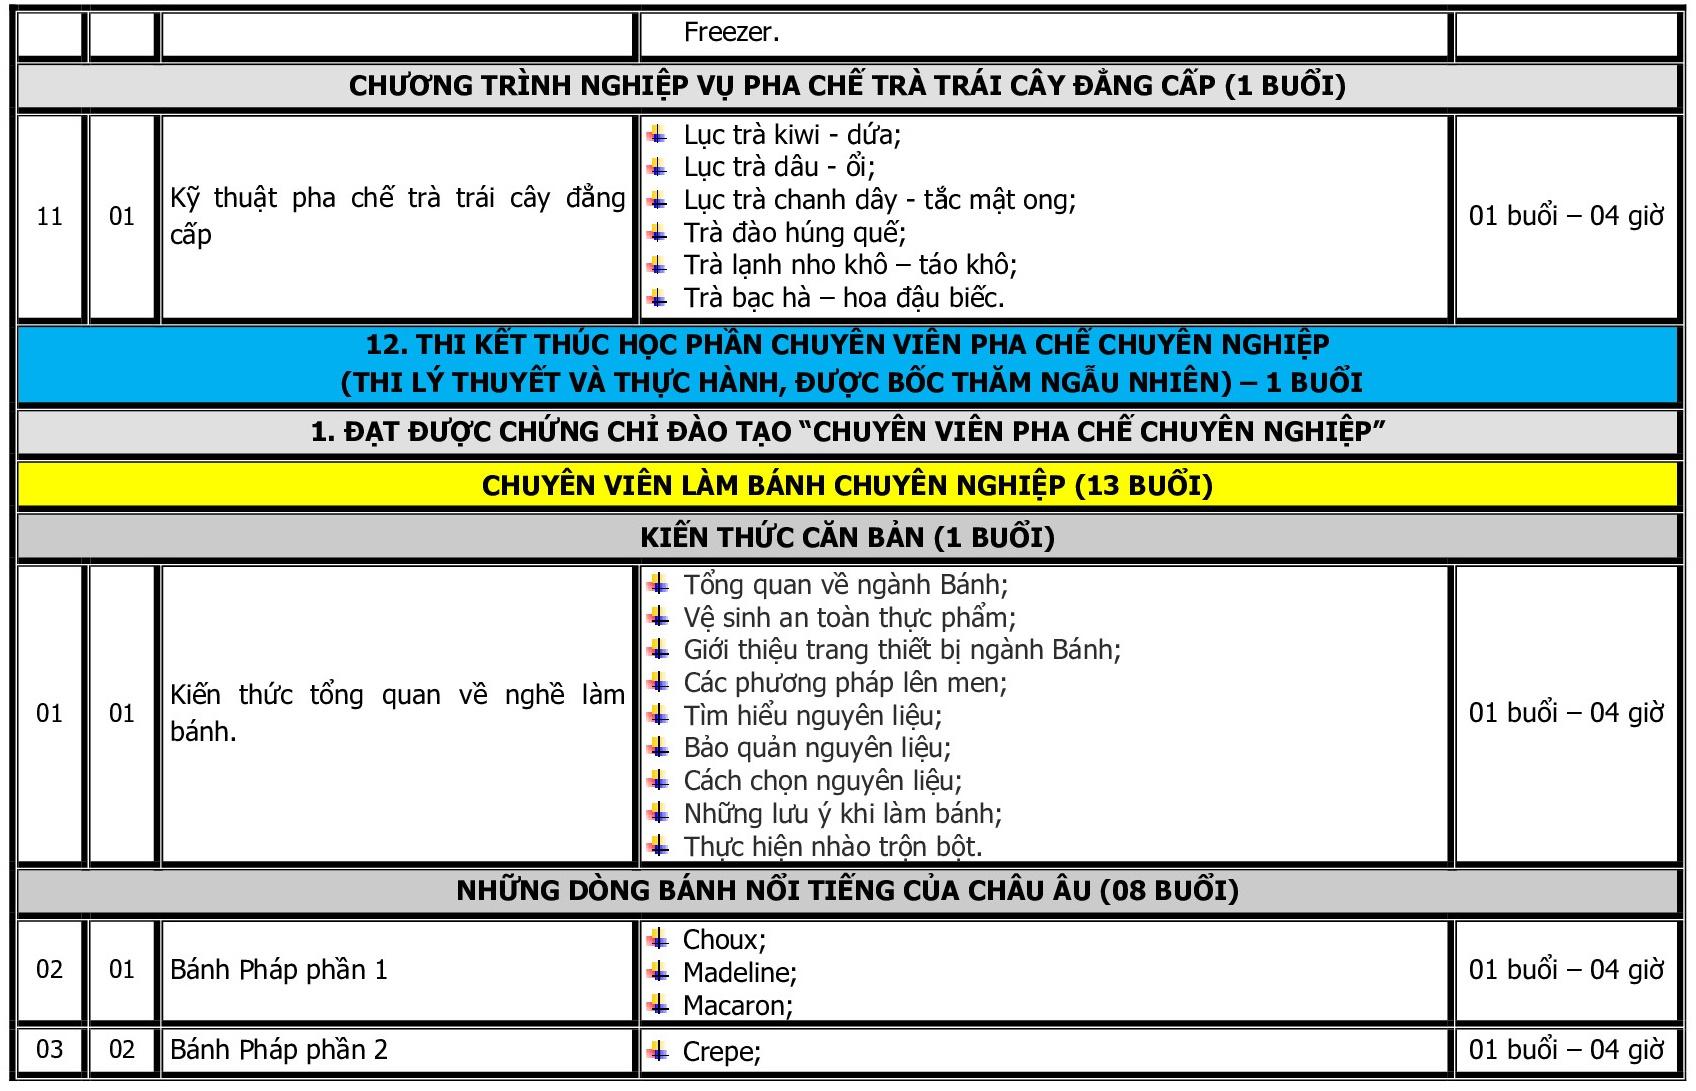 CT DAO TAO THUC HANH BAC TRUNG CAP_p003